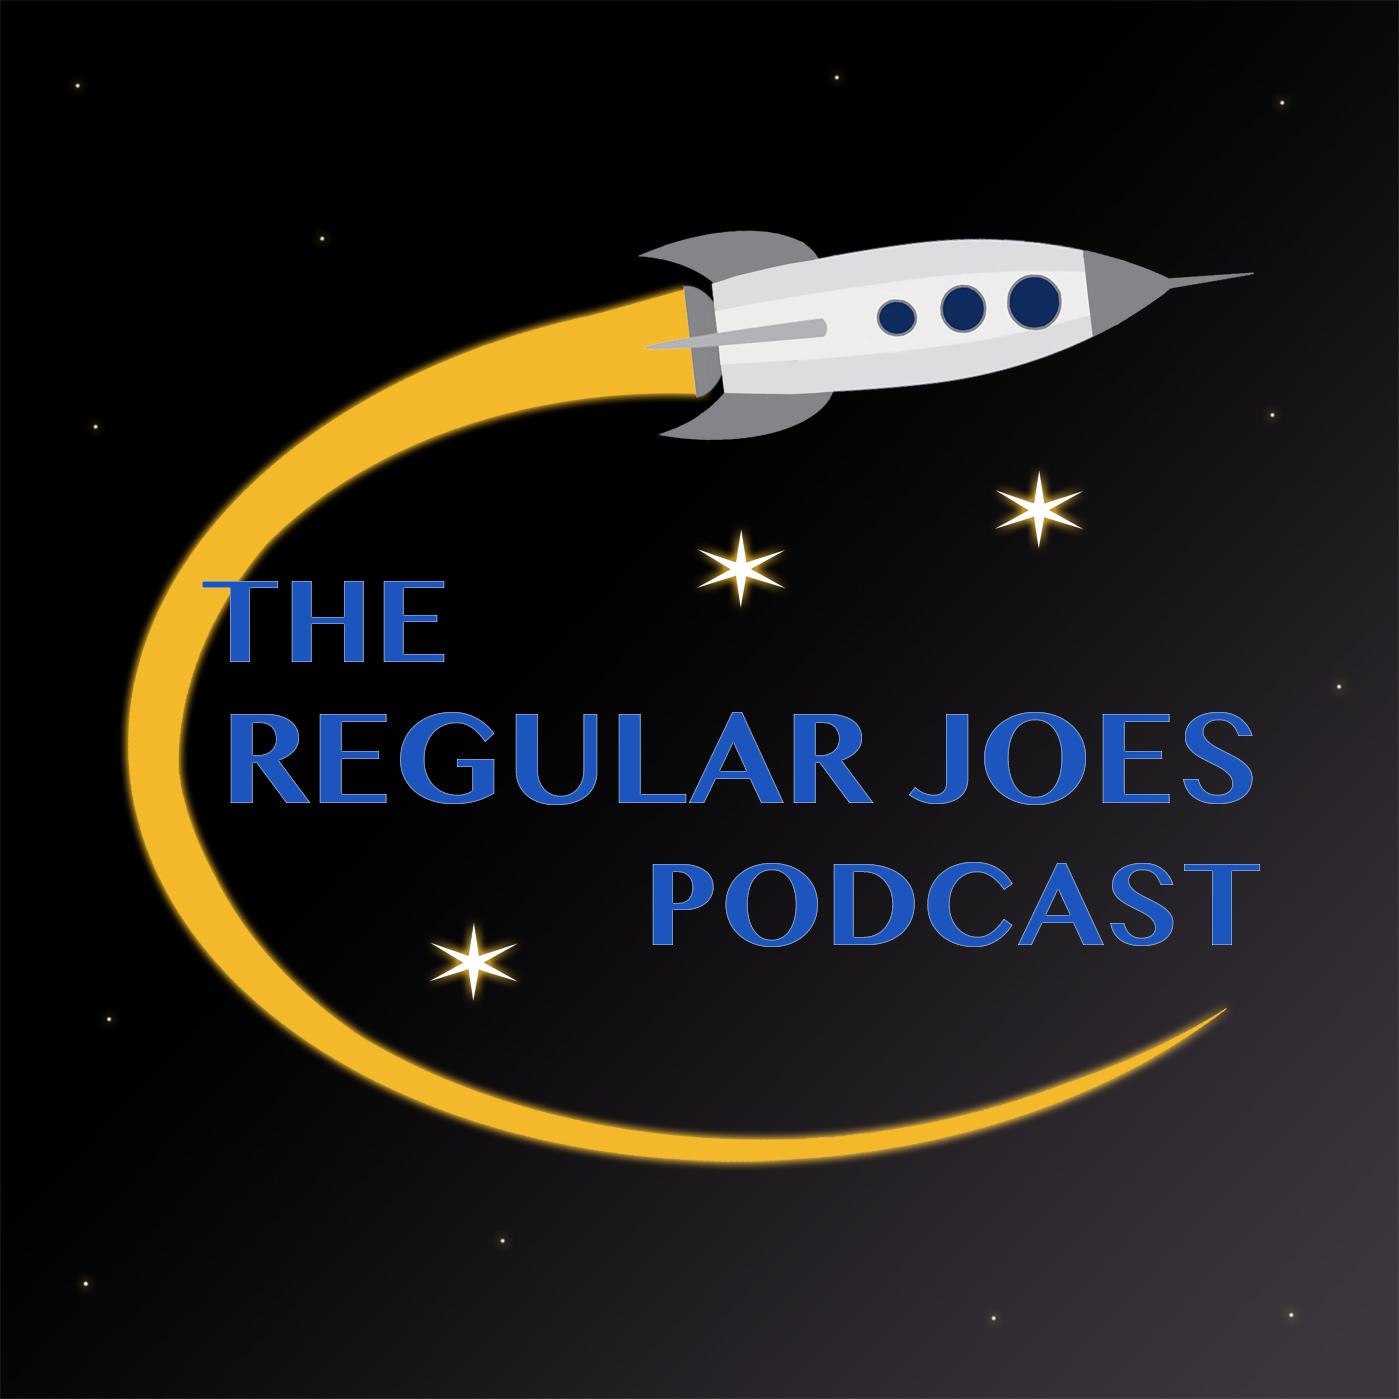 Regular Joes Podcast show art